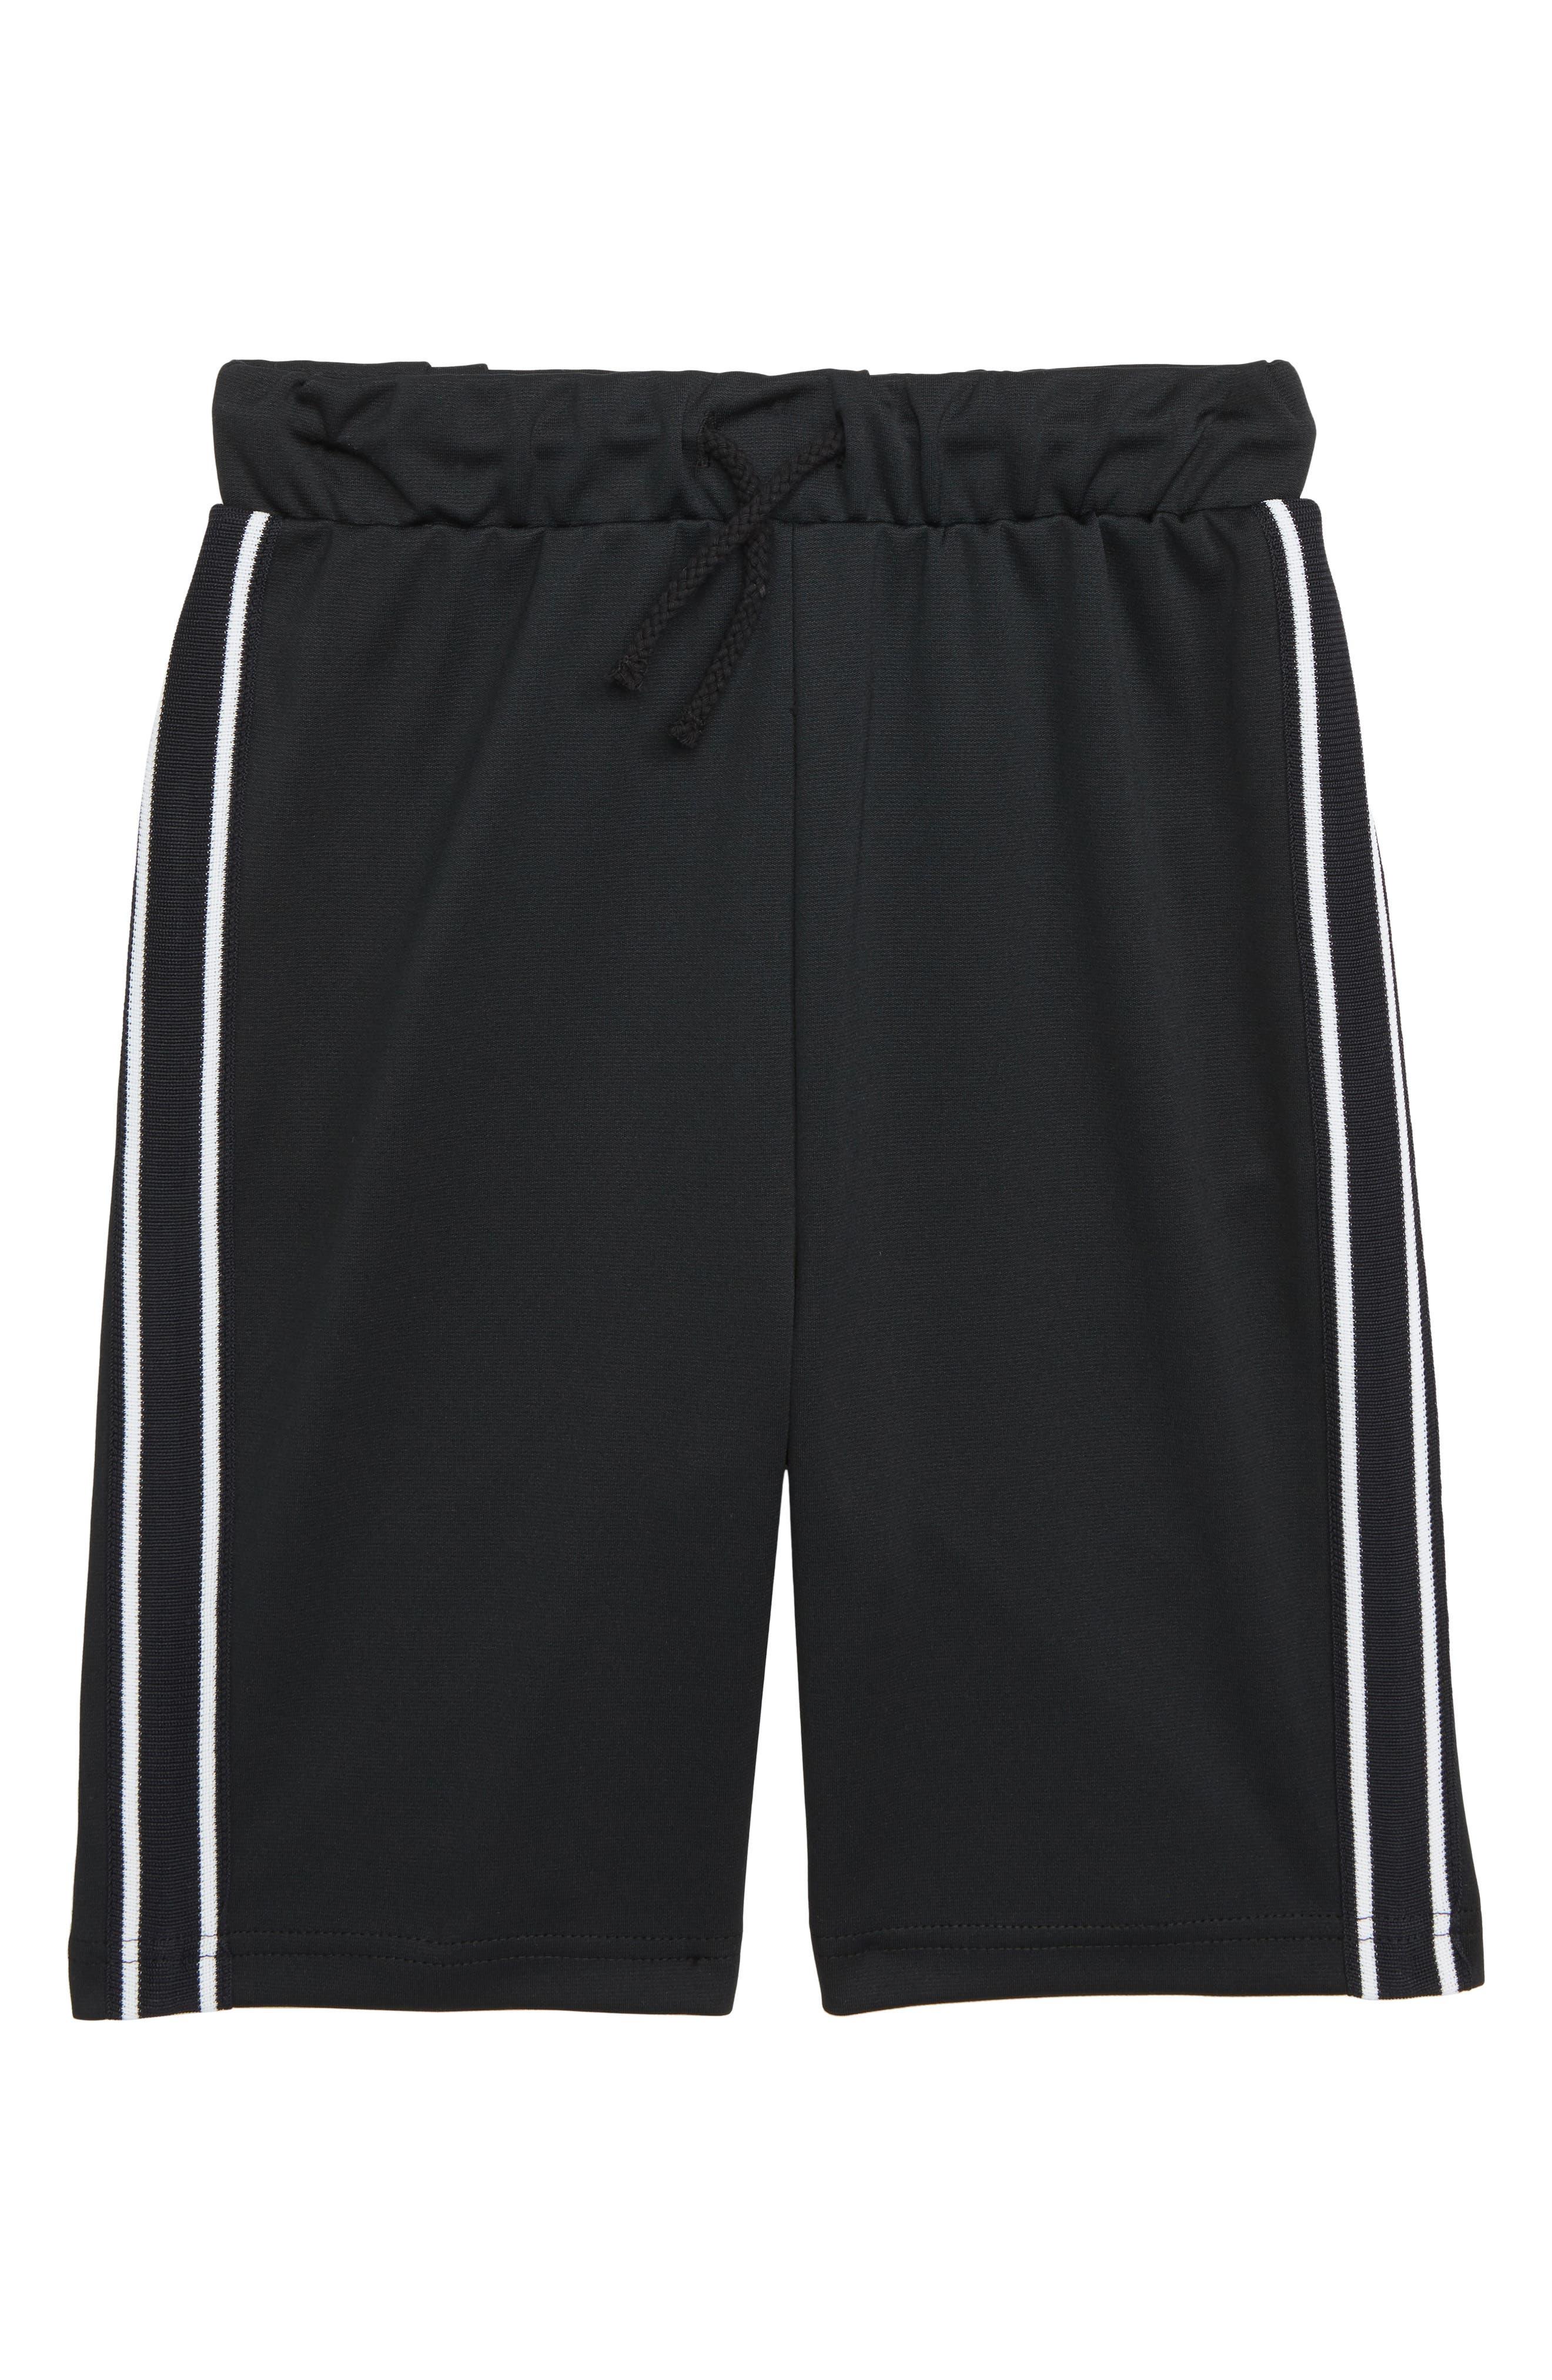 Boys Sometime Soon Hector Shorts Size 6Y  Black